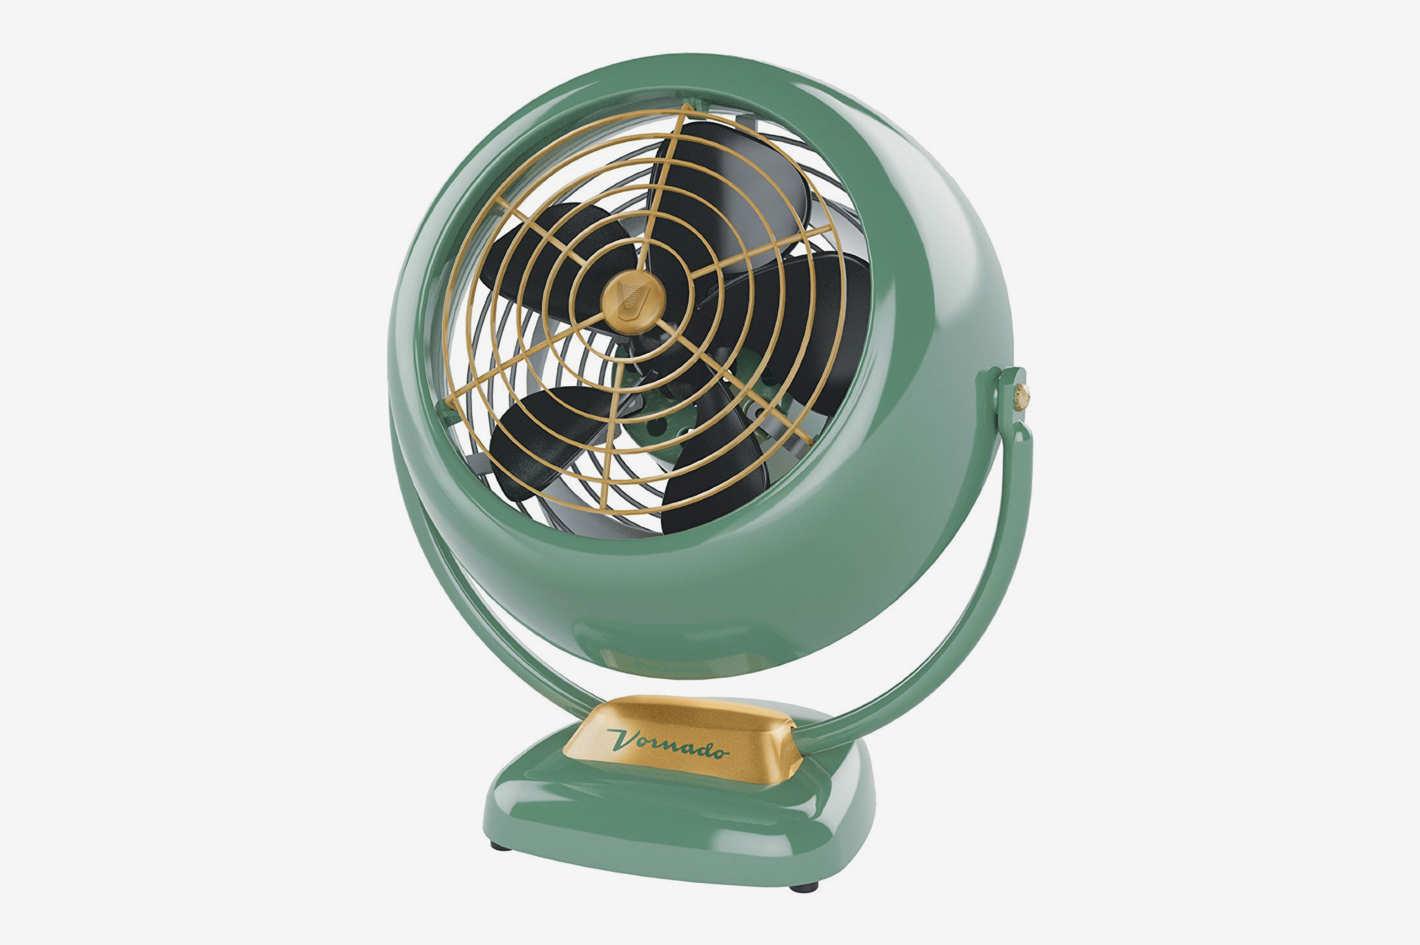 Vornado VFAN Vintage Air Circulator Green Fan